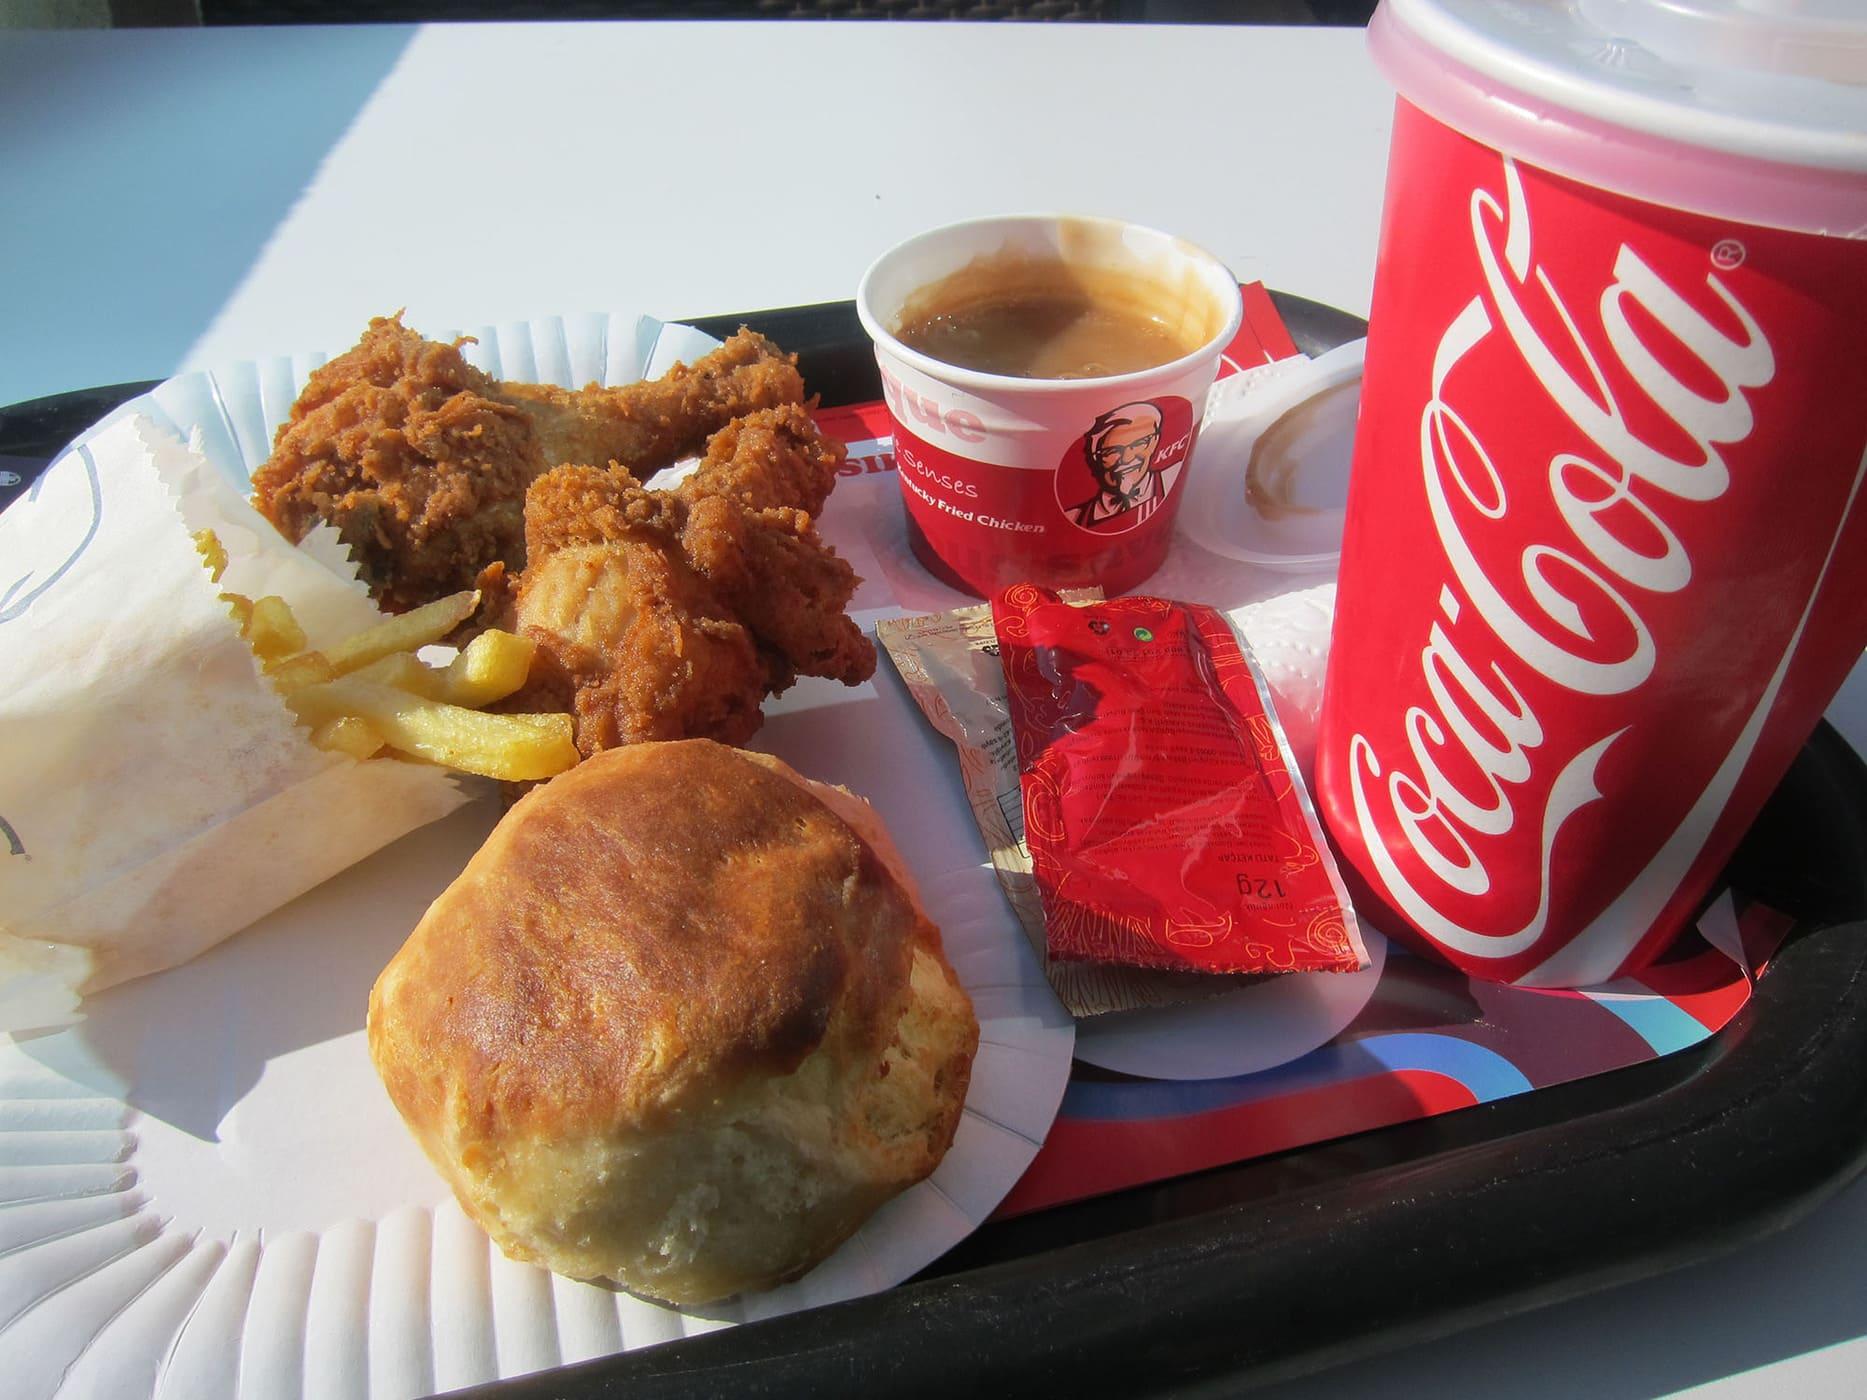 KFC in Izmir, Turkey